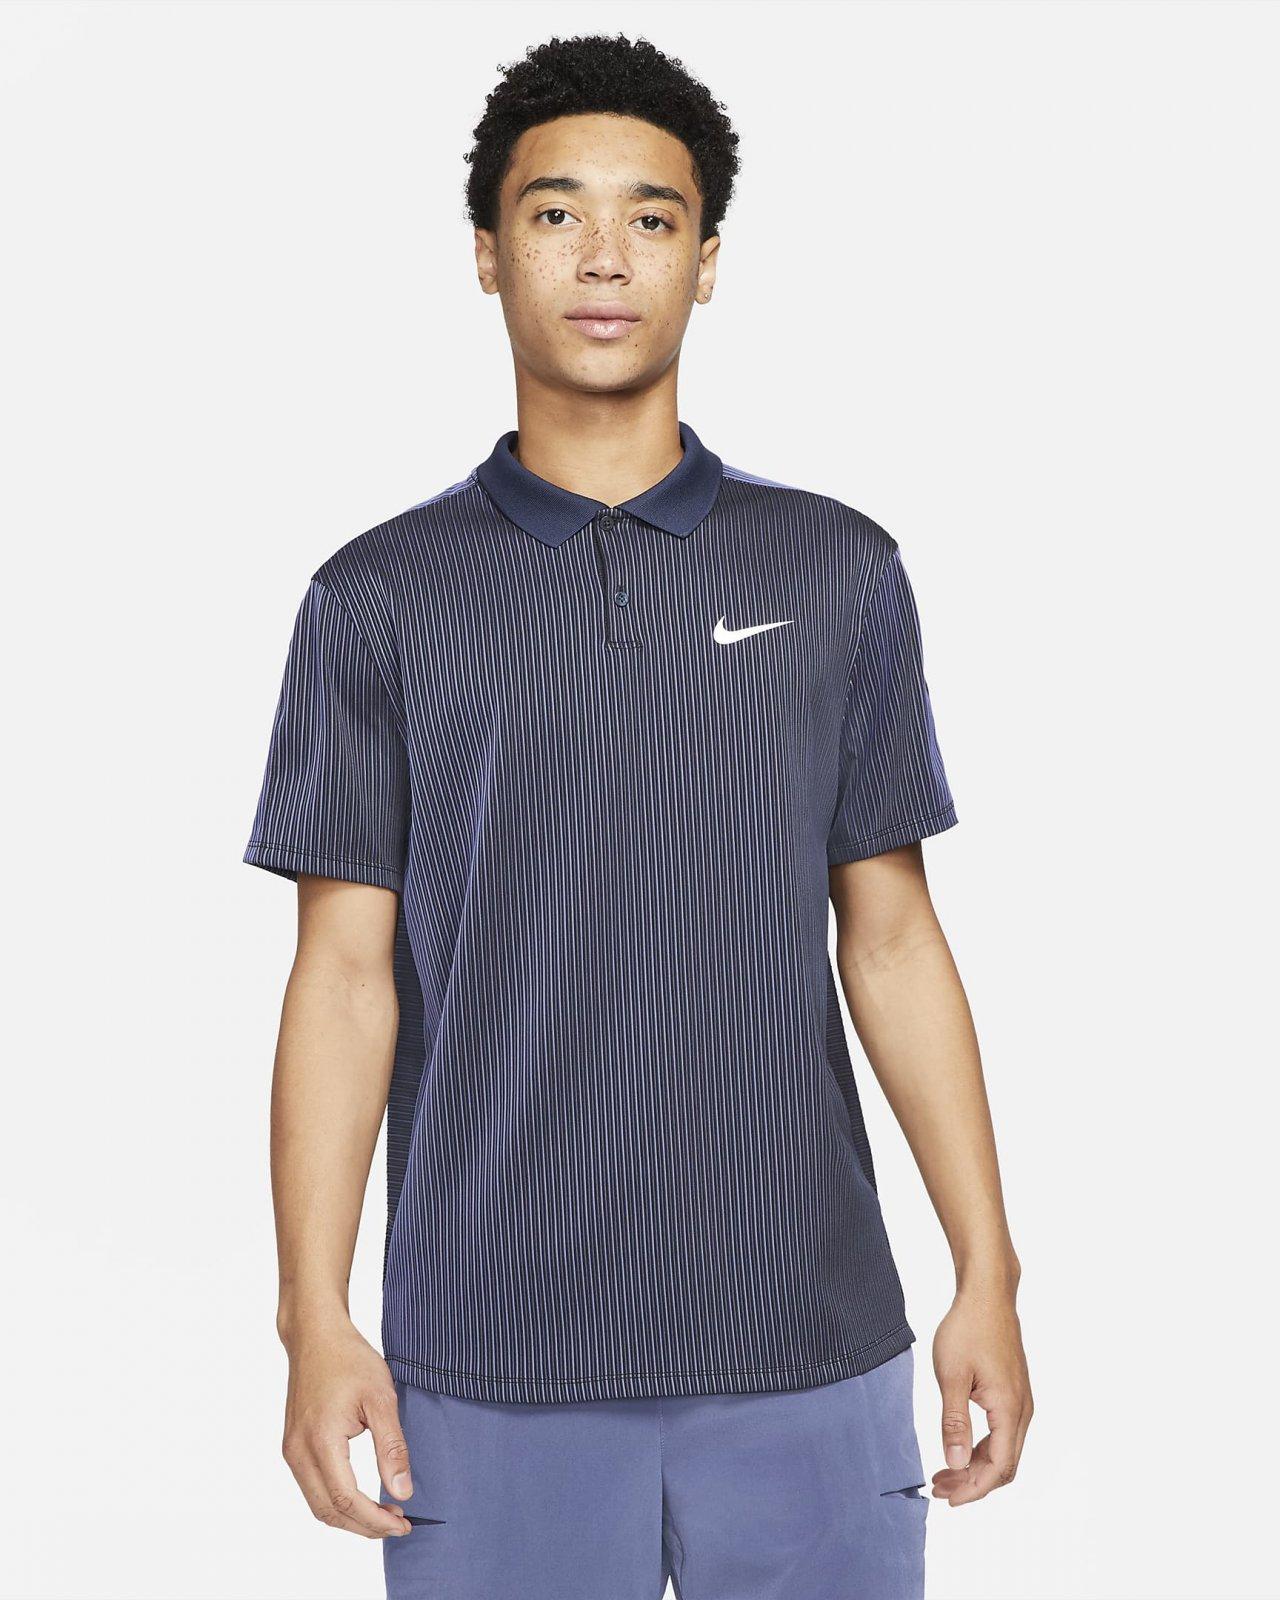 nikecourt-dri-fit-adv-slam-mens-tennis-polo-NDx9HR.png.jpeg